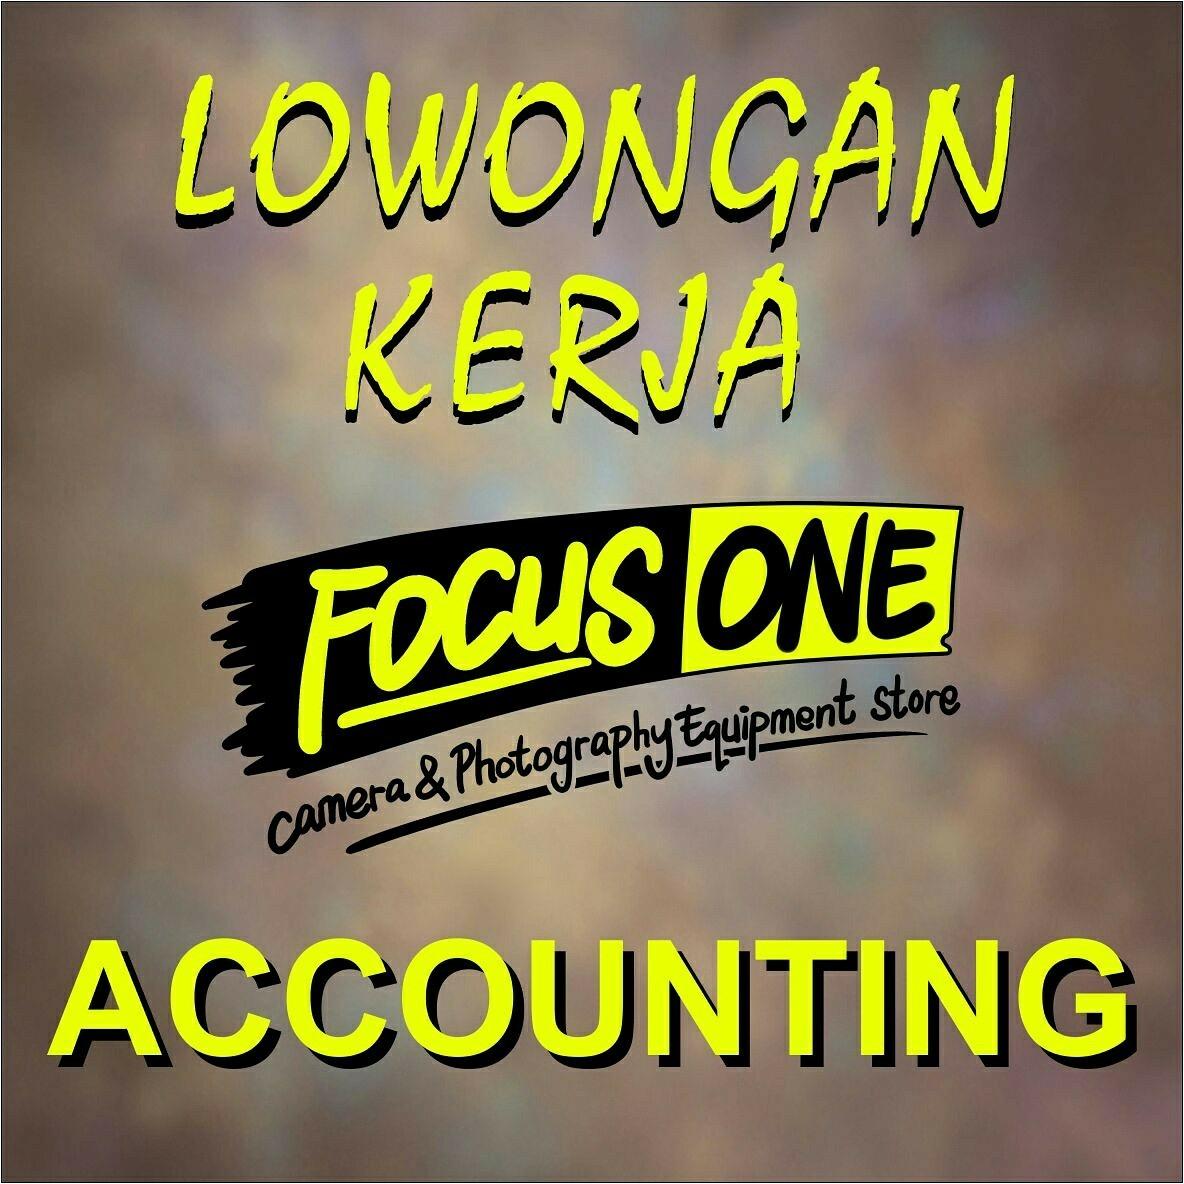 Lowongan Kerja Accounting - Toko Kamera Focus One - Bandar Lampung